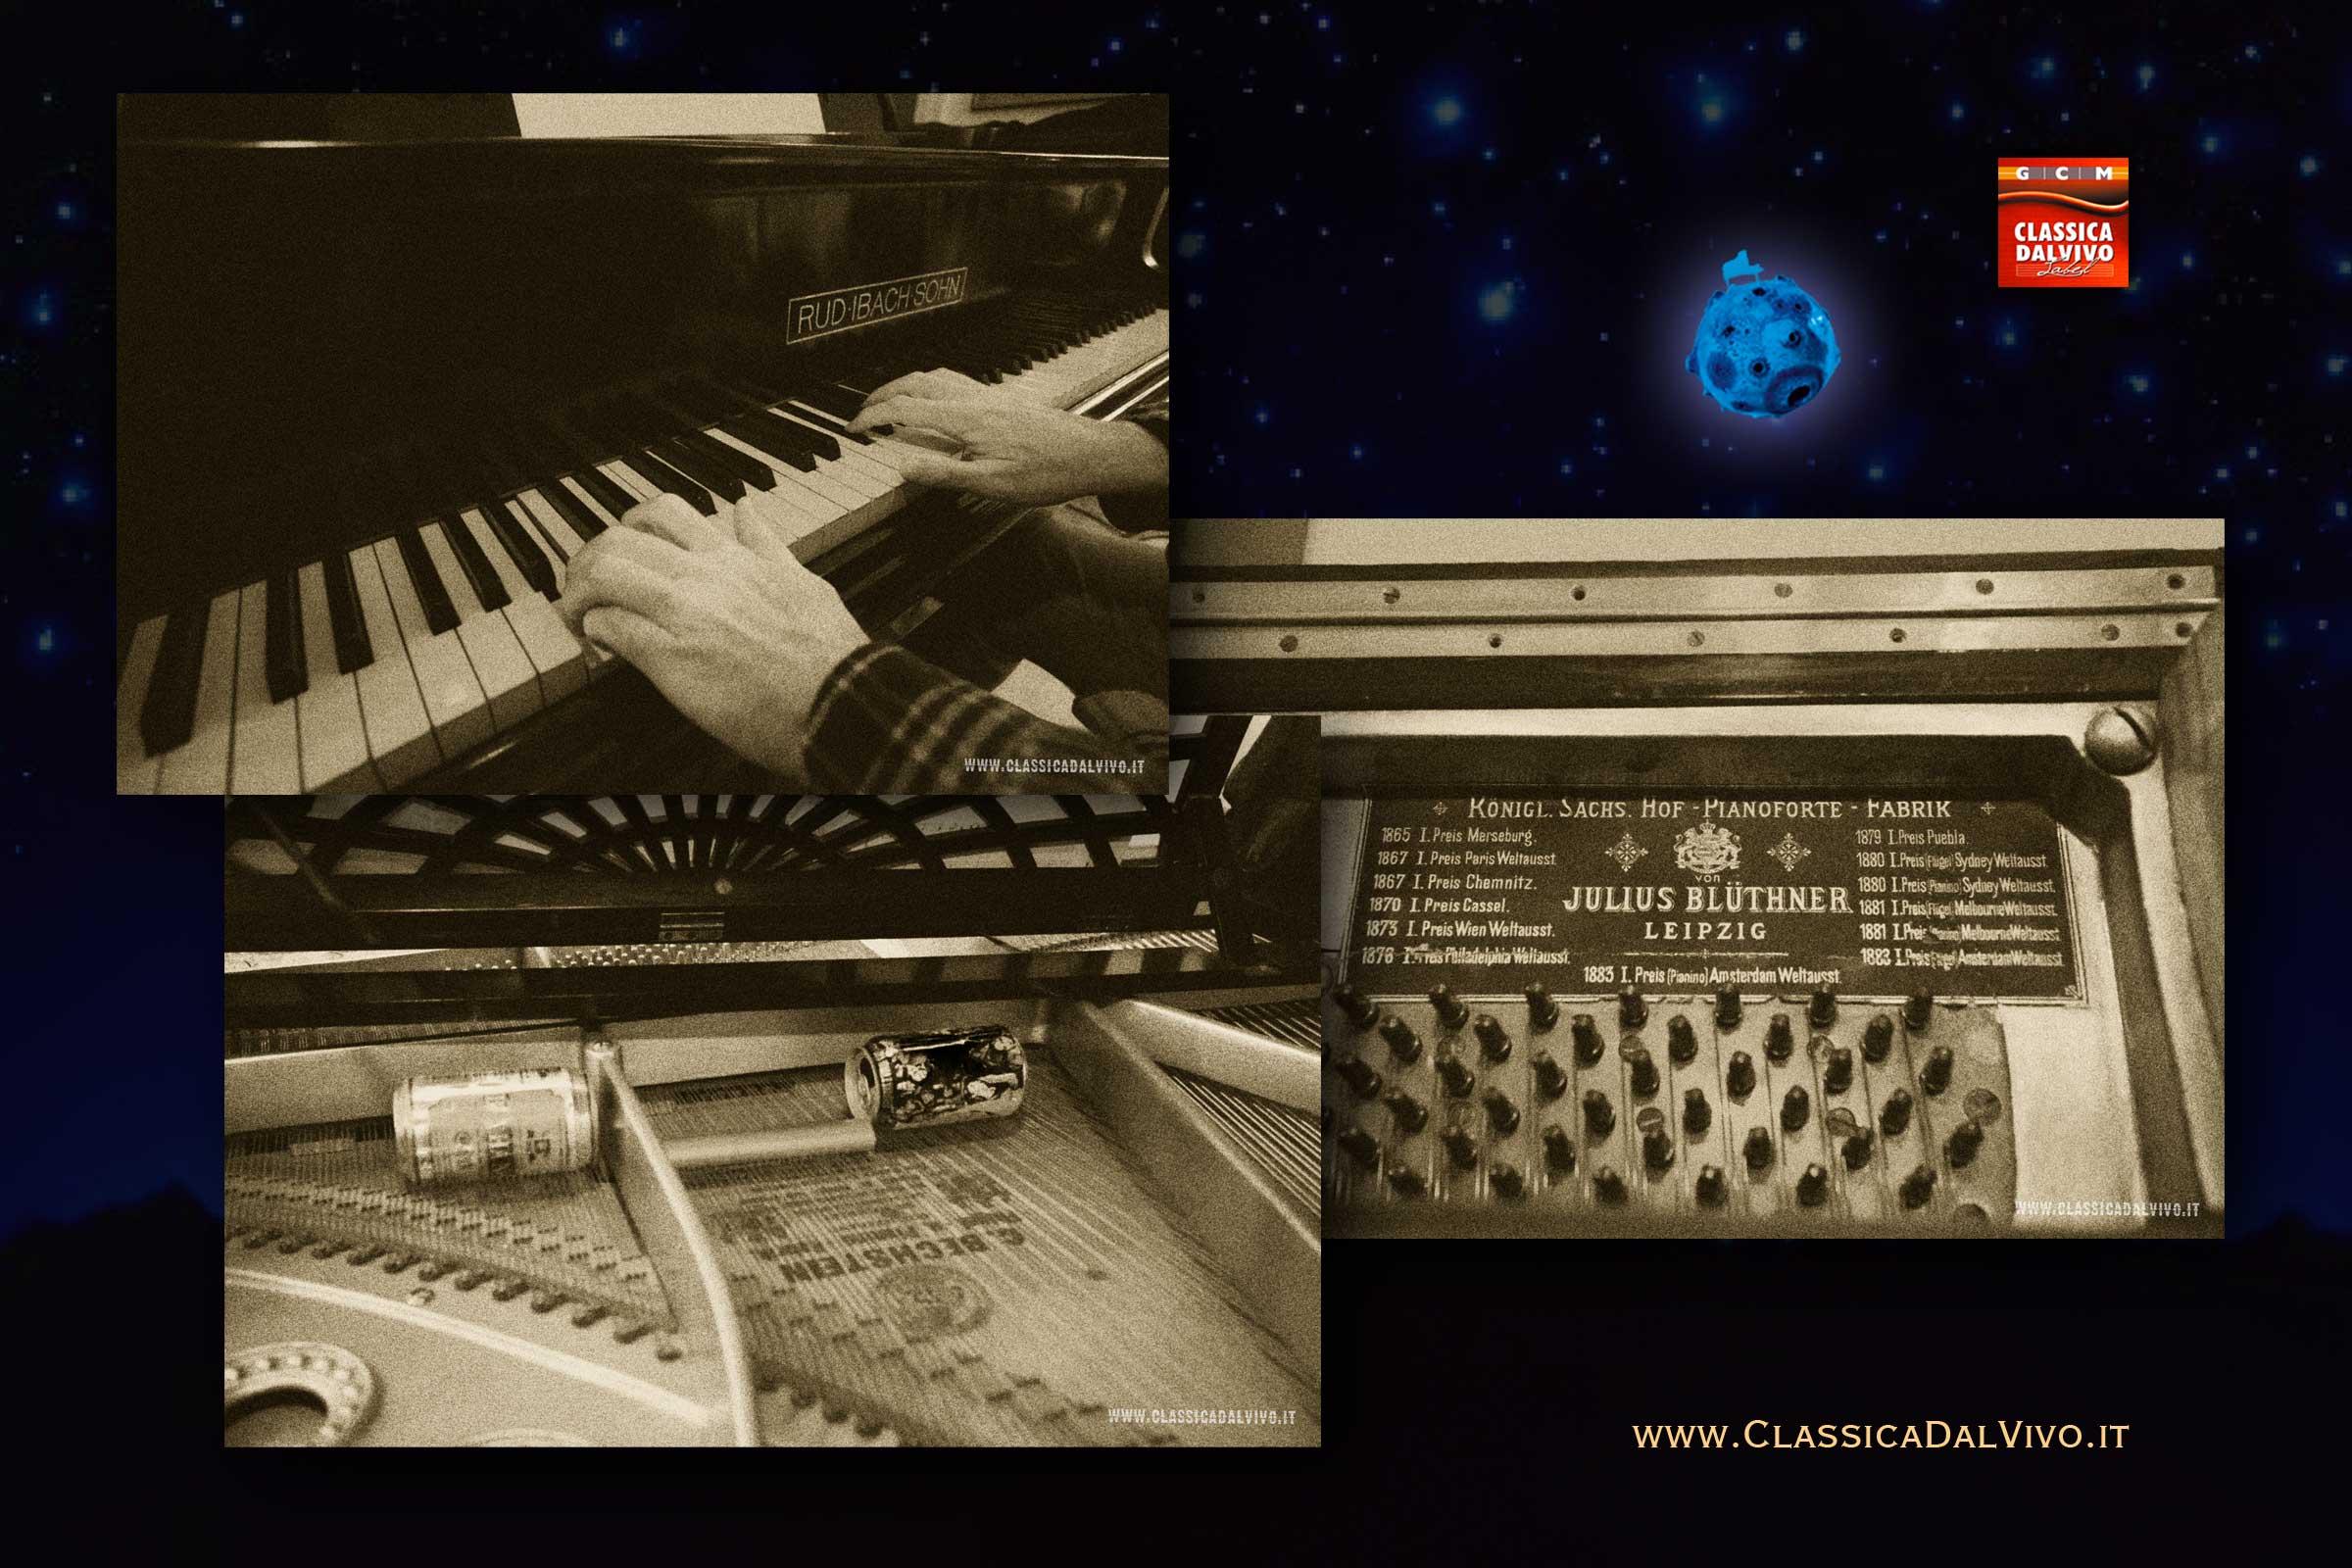 Trivella Piano Duo: American Journeys